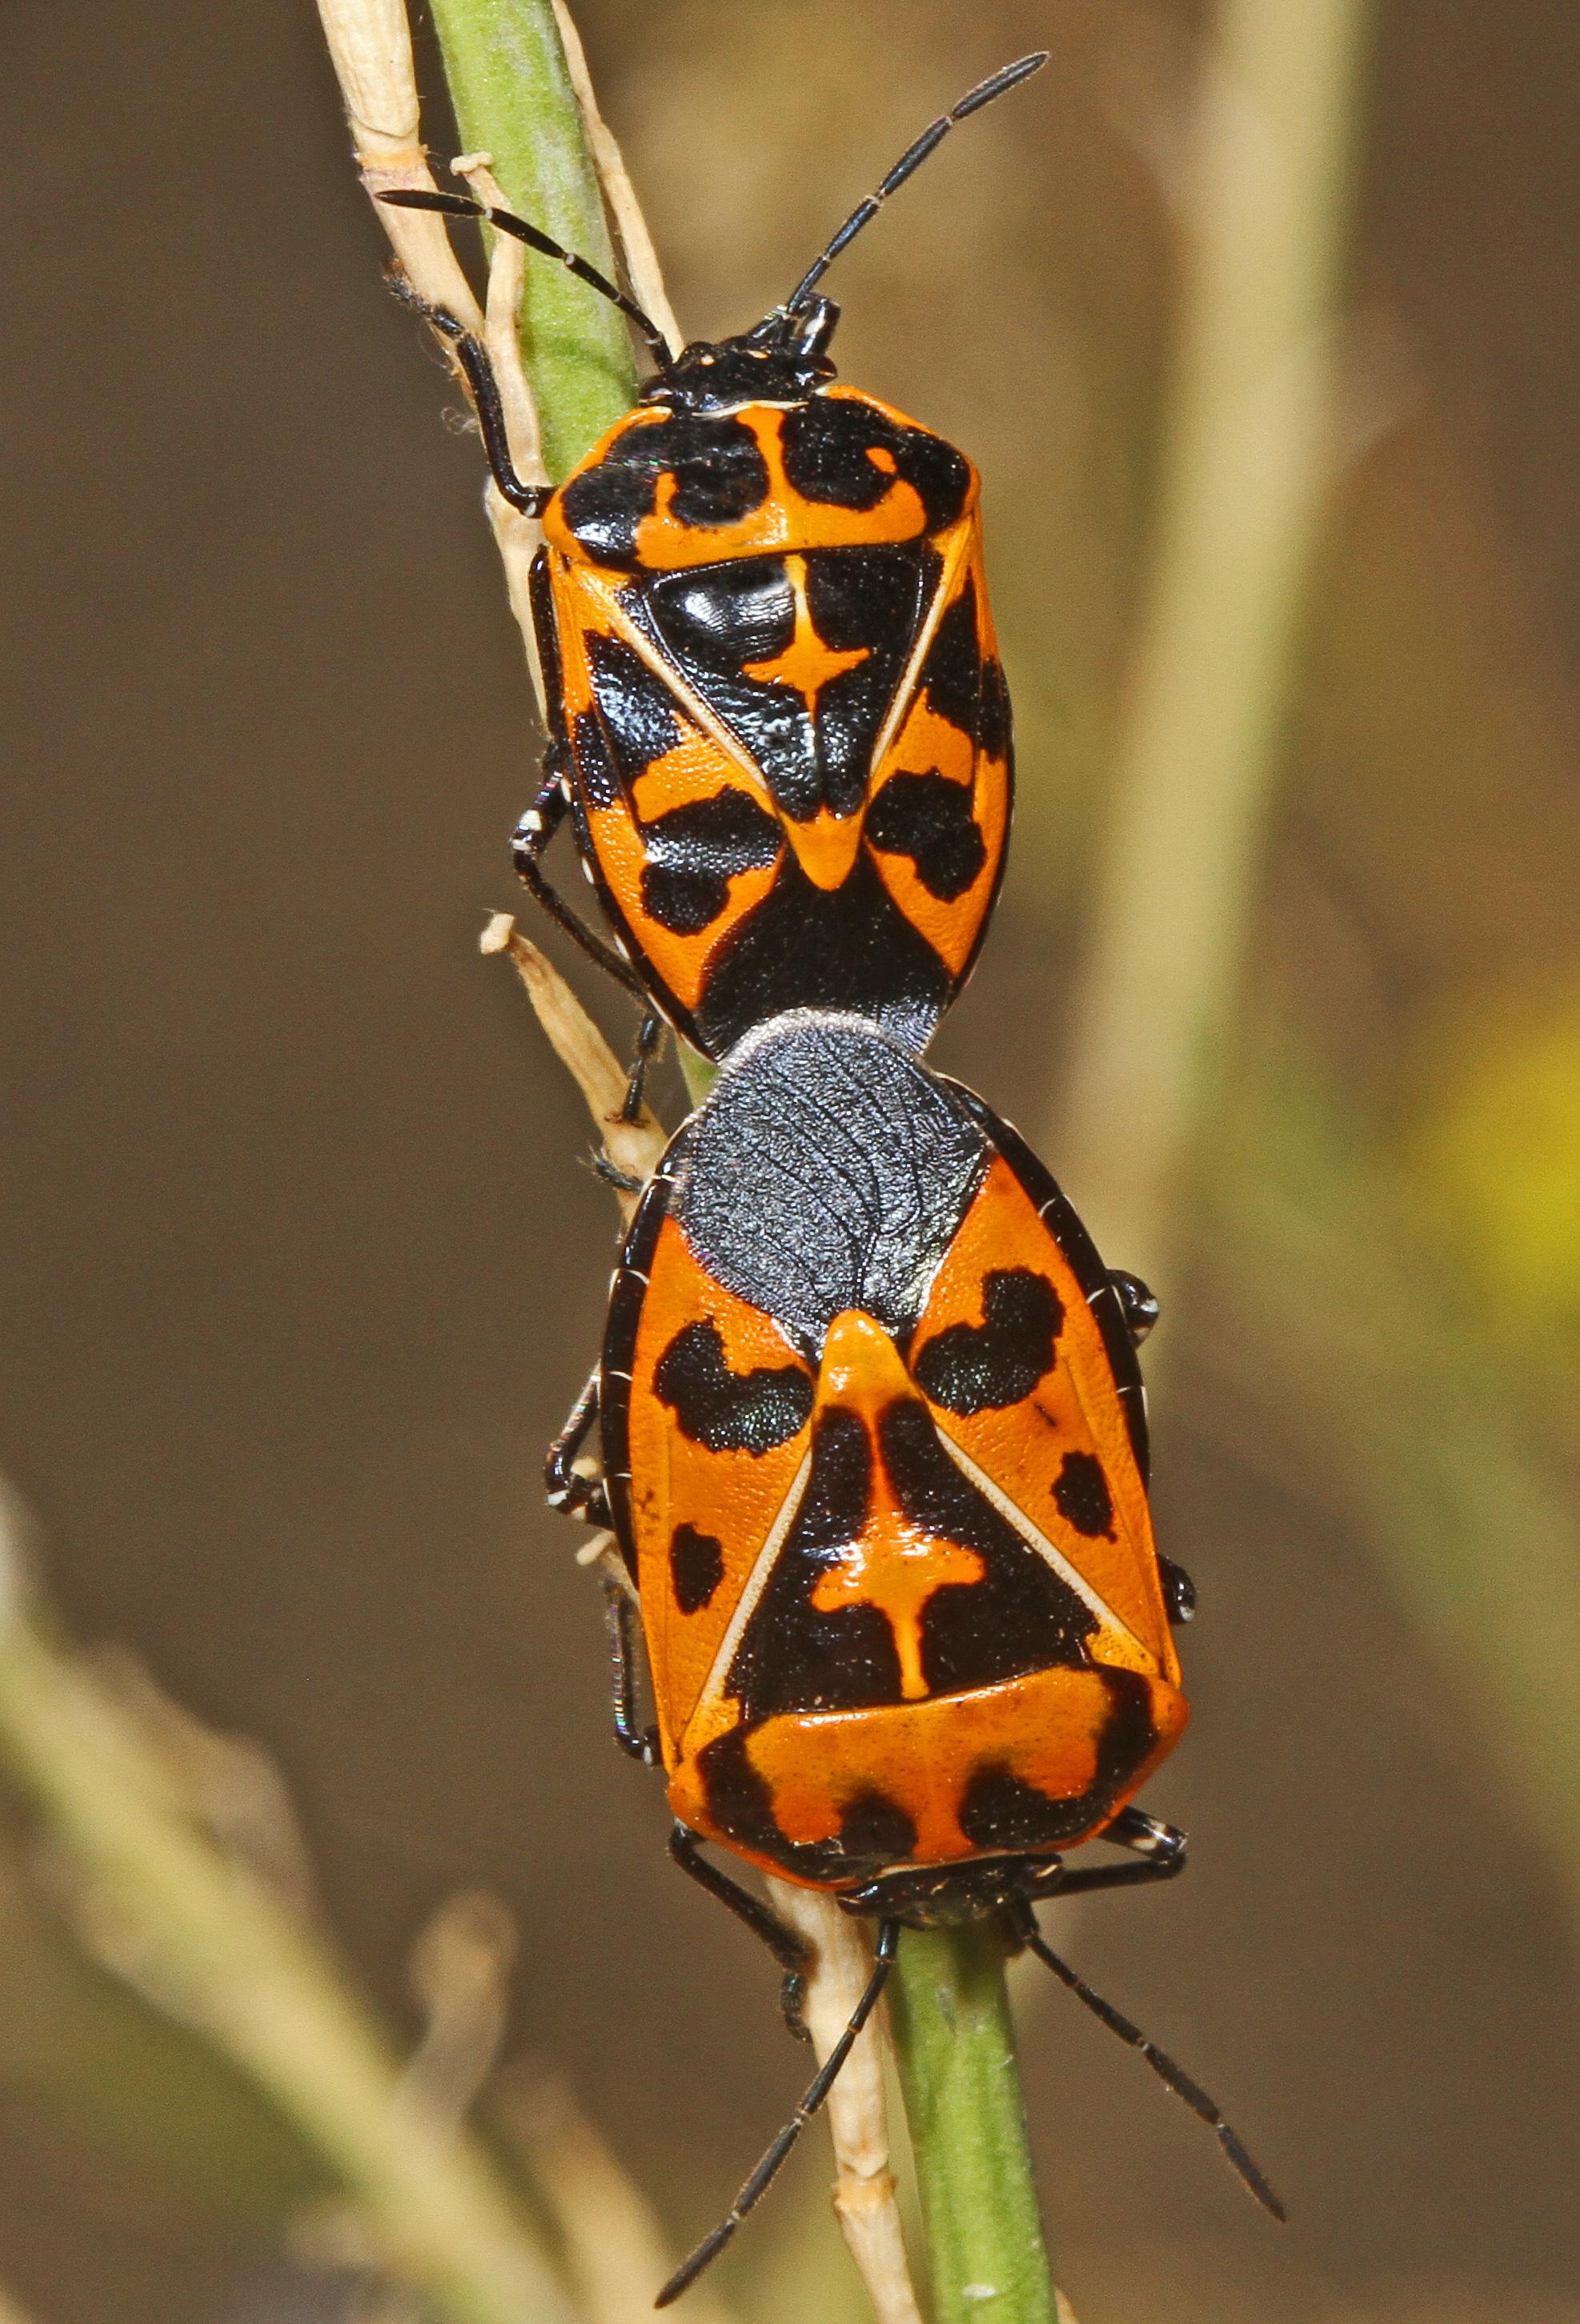 Harlequin cabbage bug - Wikipedia